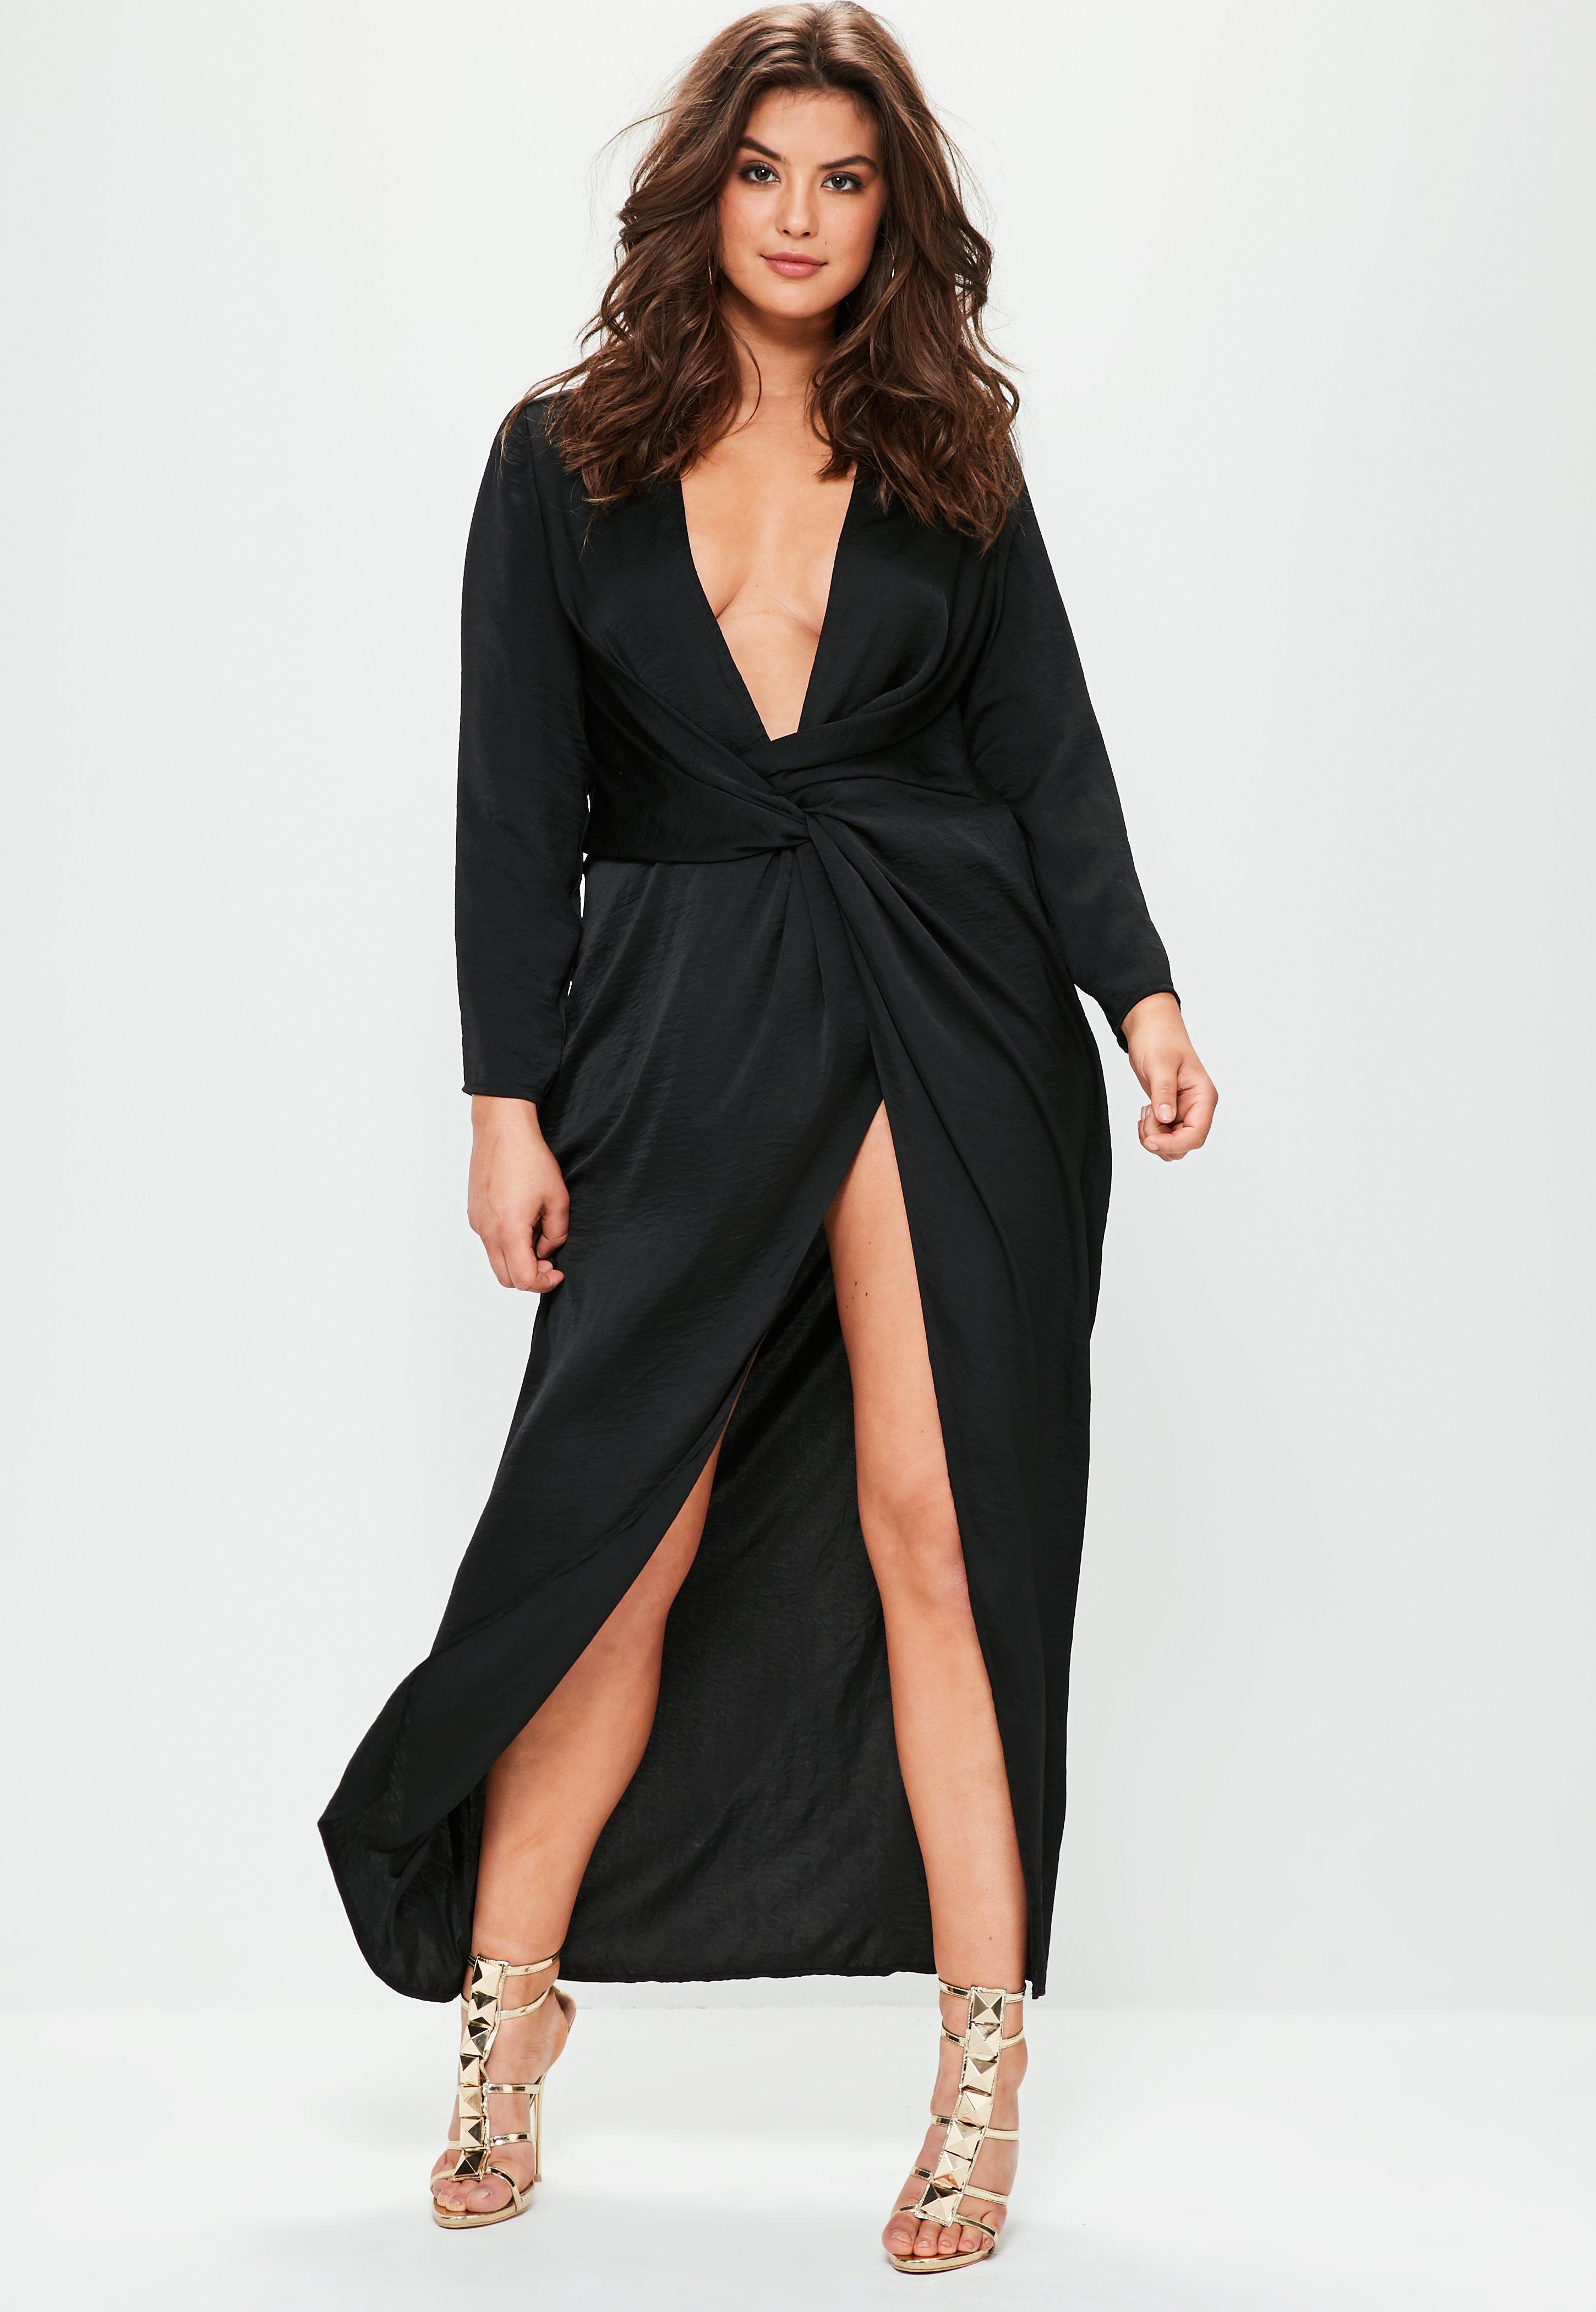 Plus Size Black Satin Thigh Split Wrap Maxi Dress | Missguided